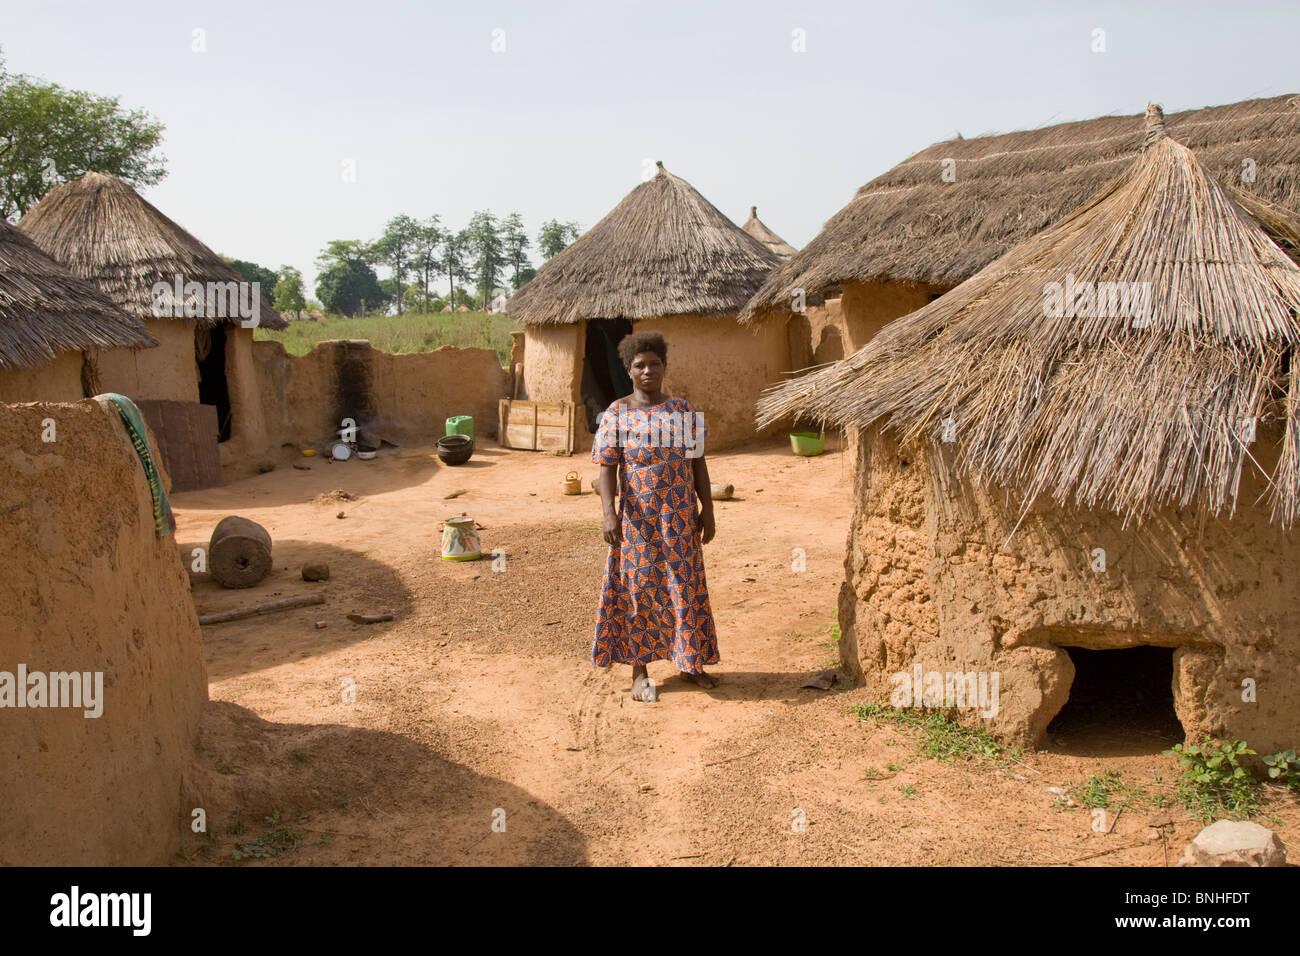 Mamprusi woman at the village of Sor No. 1, Gonja triangle, Damango district, Ghana. Stock Photo